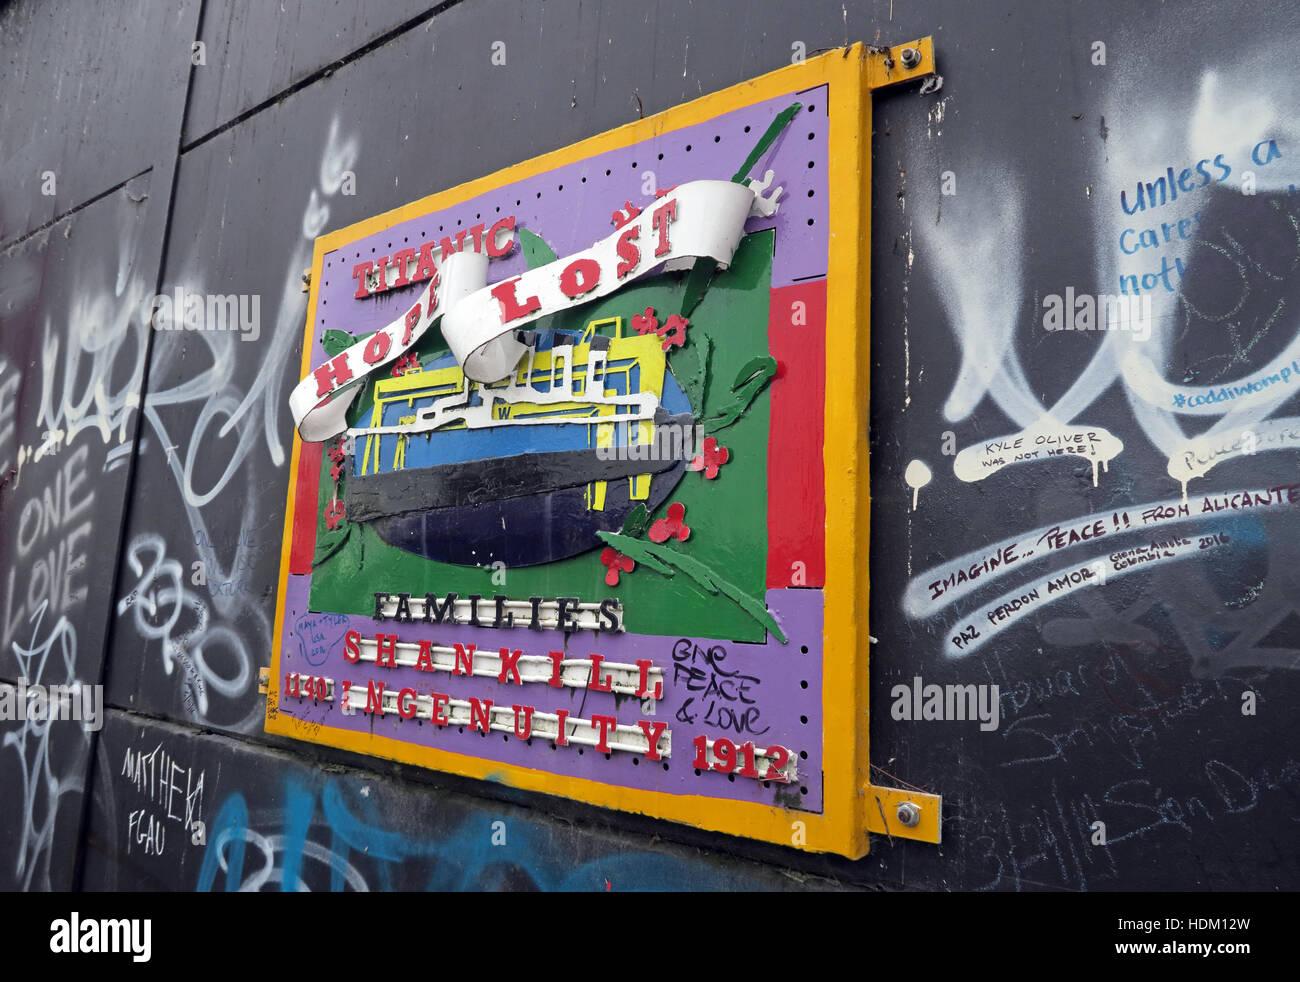 Laden Sie dieses Alamy Stockfoto Titanic Hope Lost - Belfast International Peace Wand Cupar Weg, West Belfast, NI, UK - HDM12W